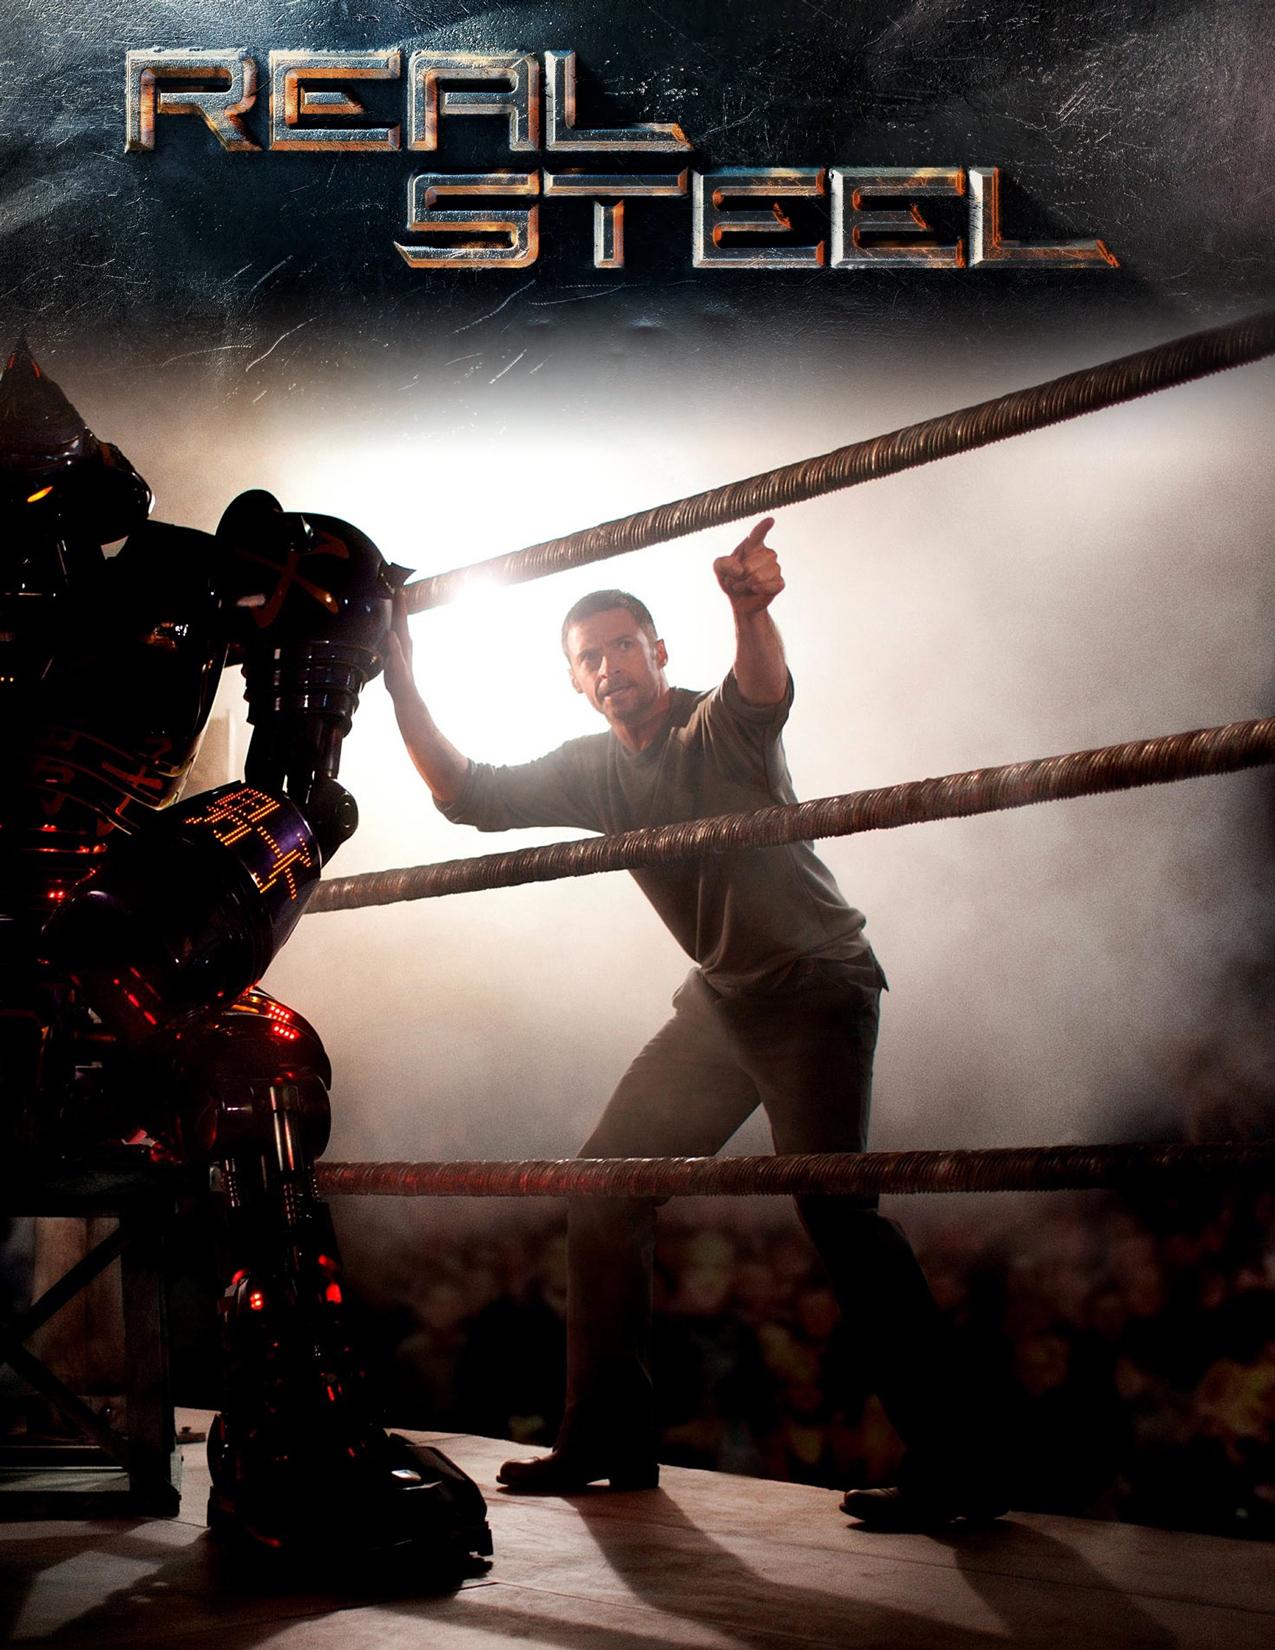 постер Настоящая сталь,Real Steel